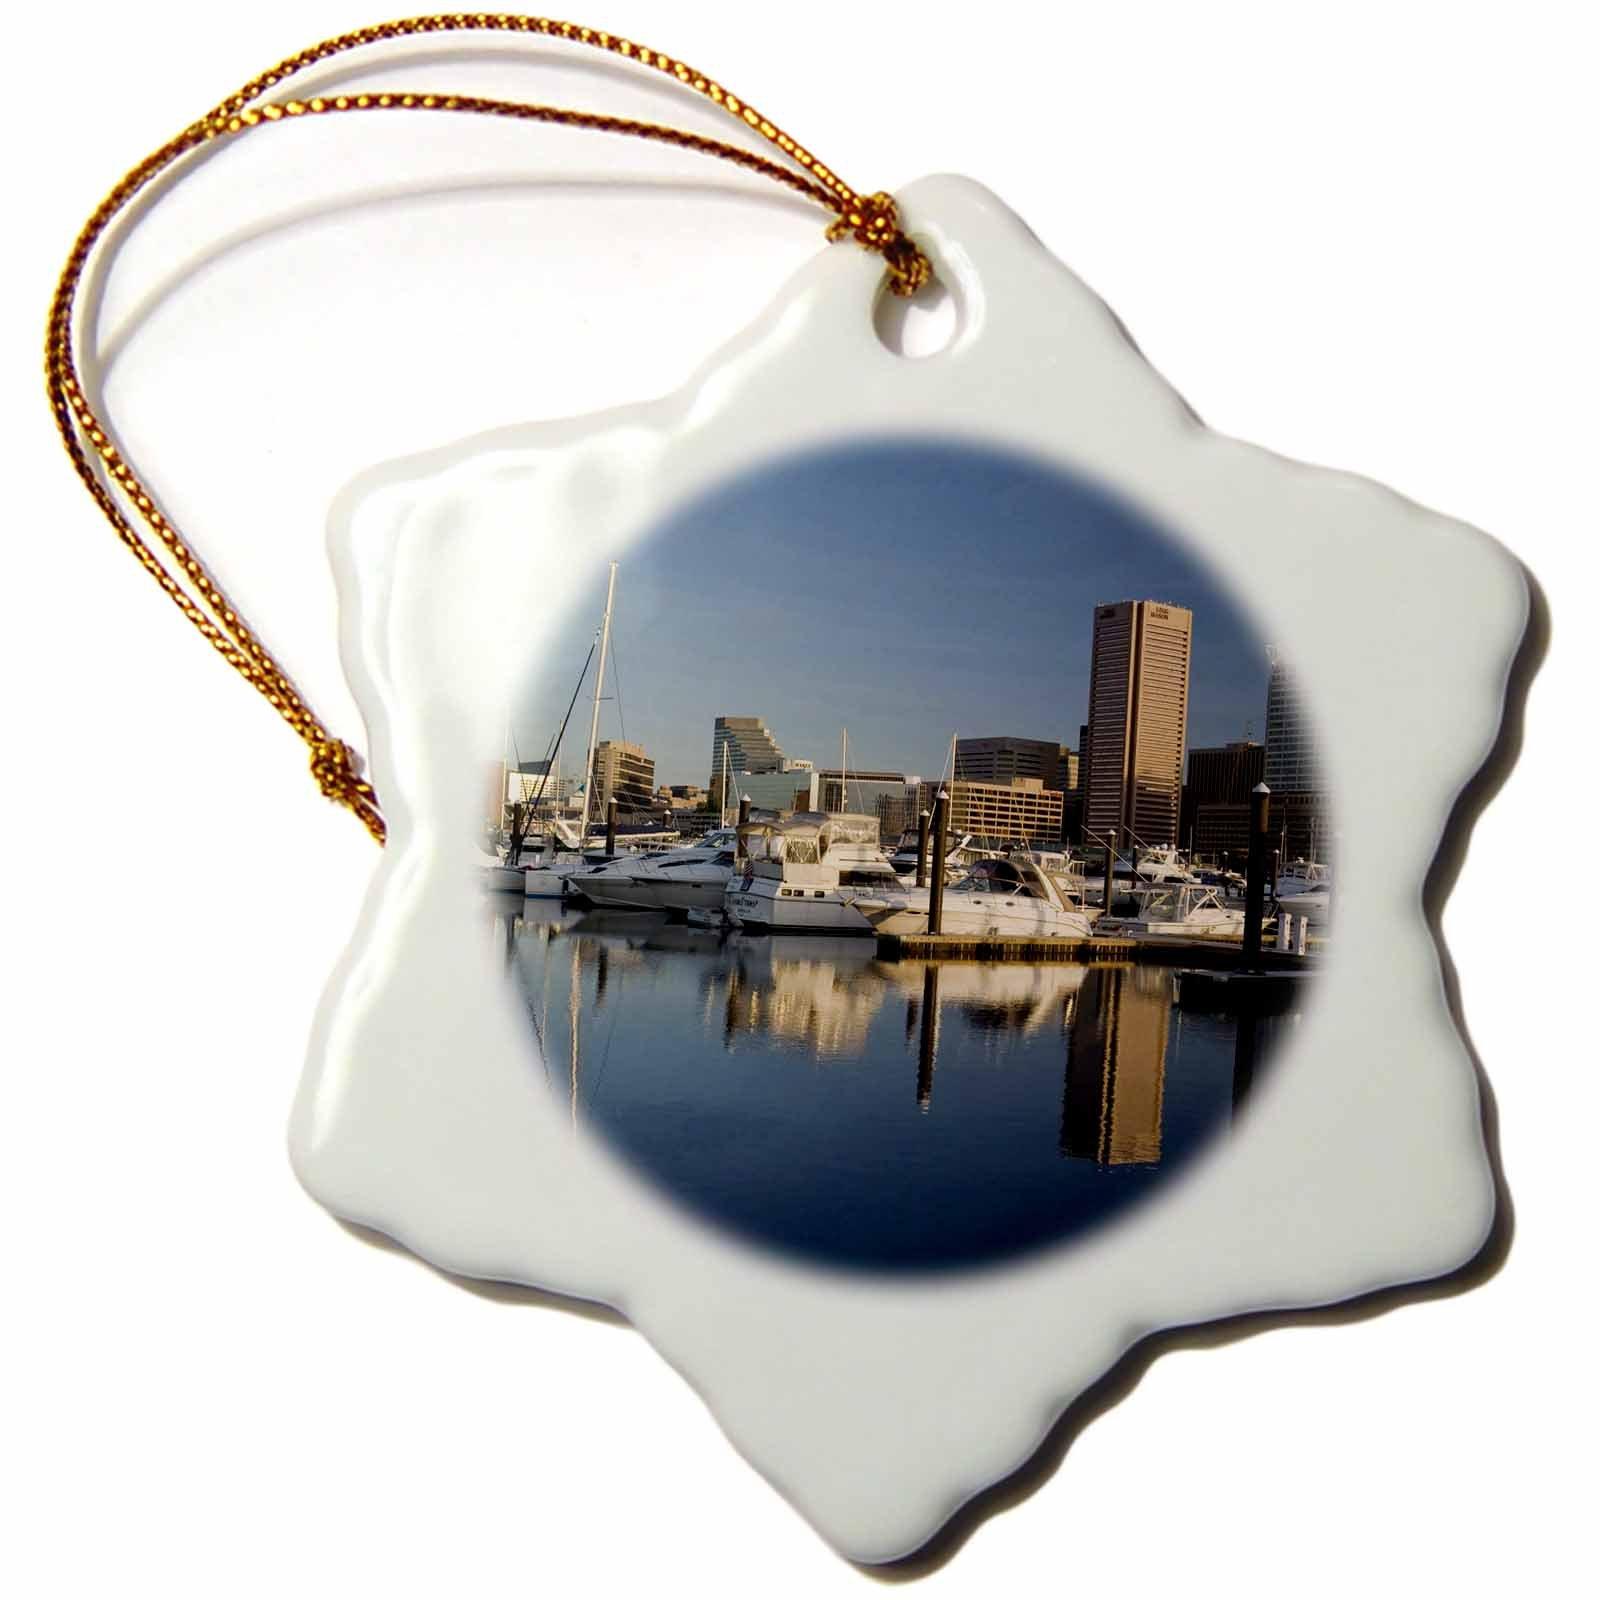 3dRose LLC orn_90790_1 Porcelain Snowflake Ornament, 3-Inch, Maryland, Baltimore, Intercontinental Hotel-Brent Bergherm